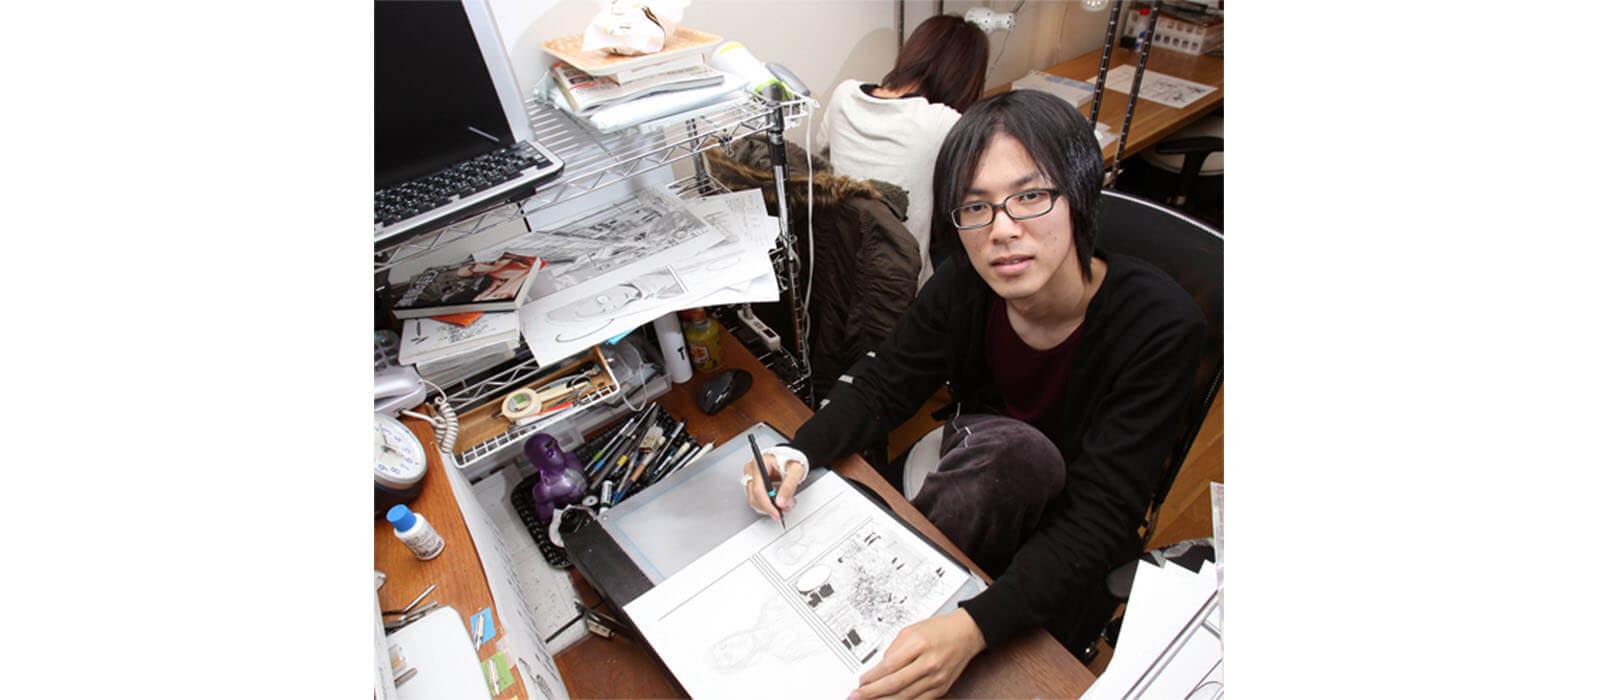 Attack On Titan mangaka - Isayama Hajime